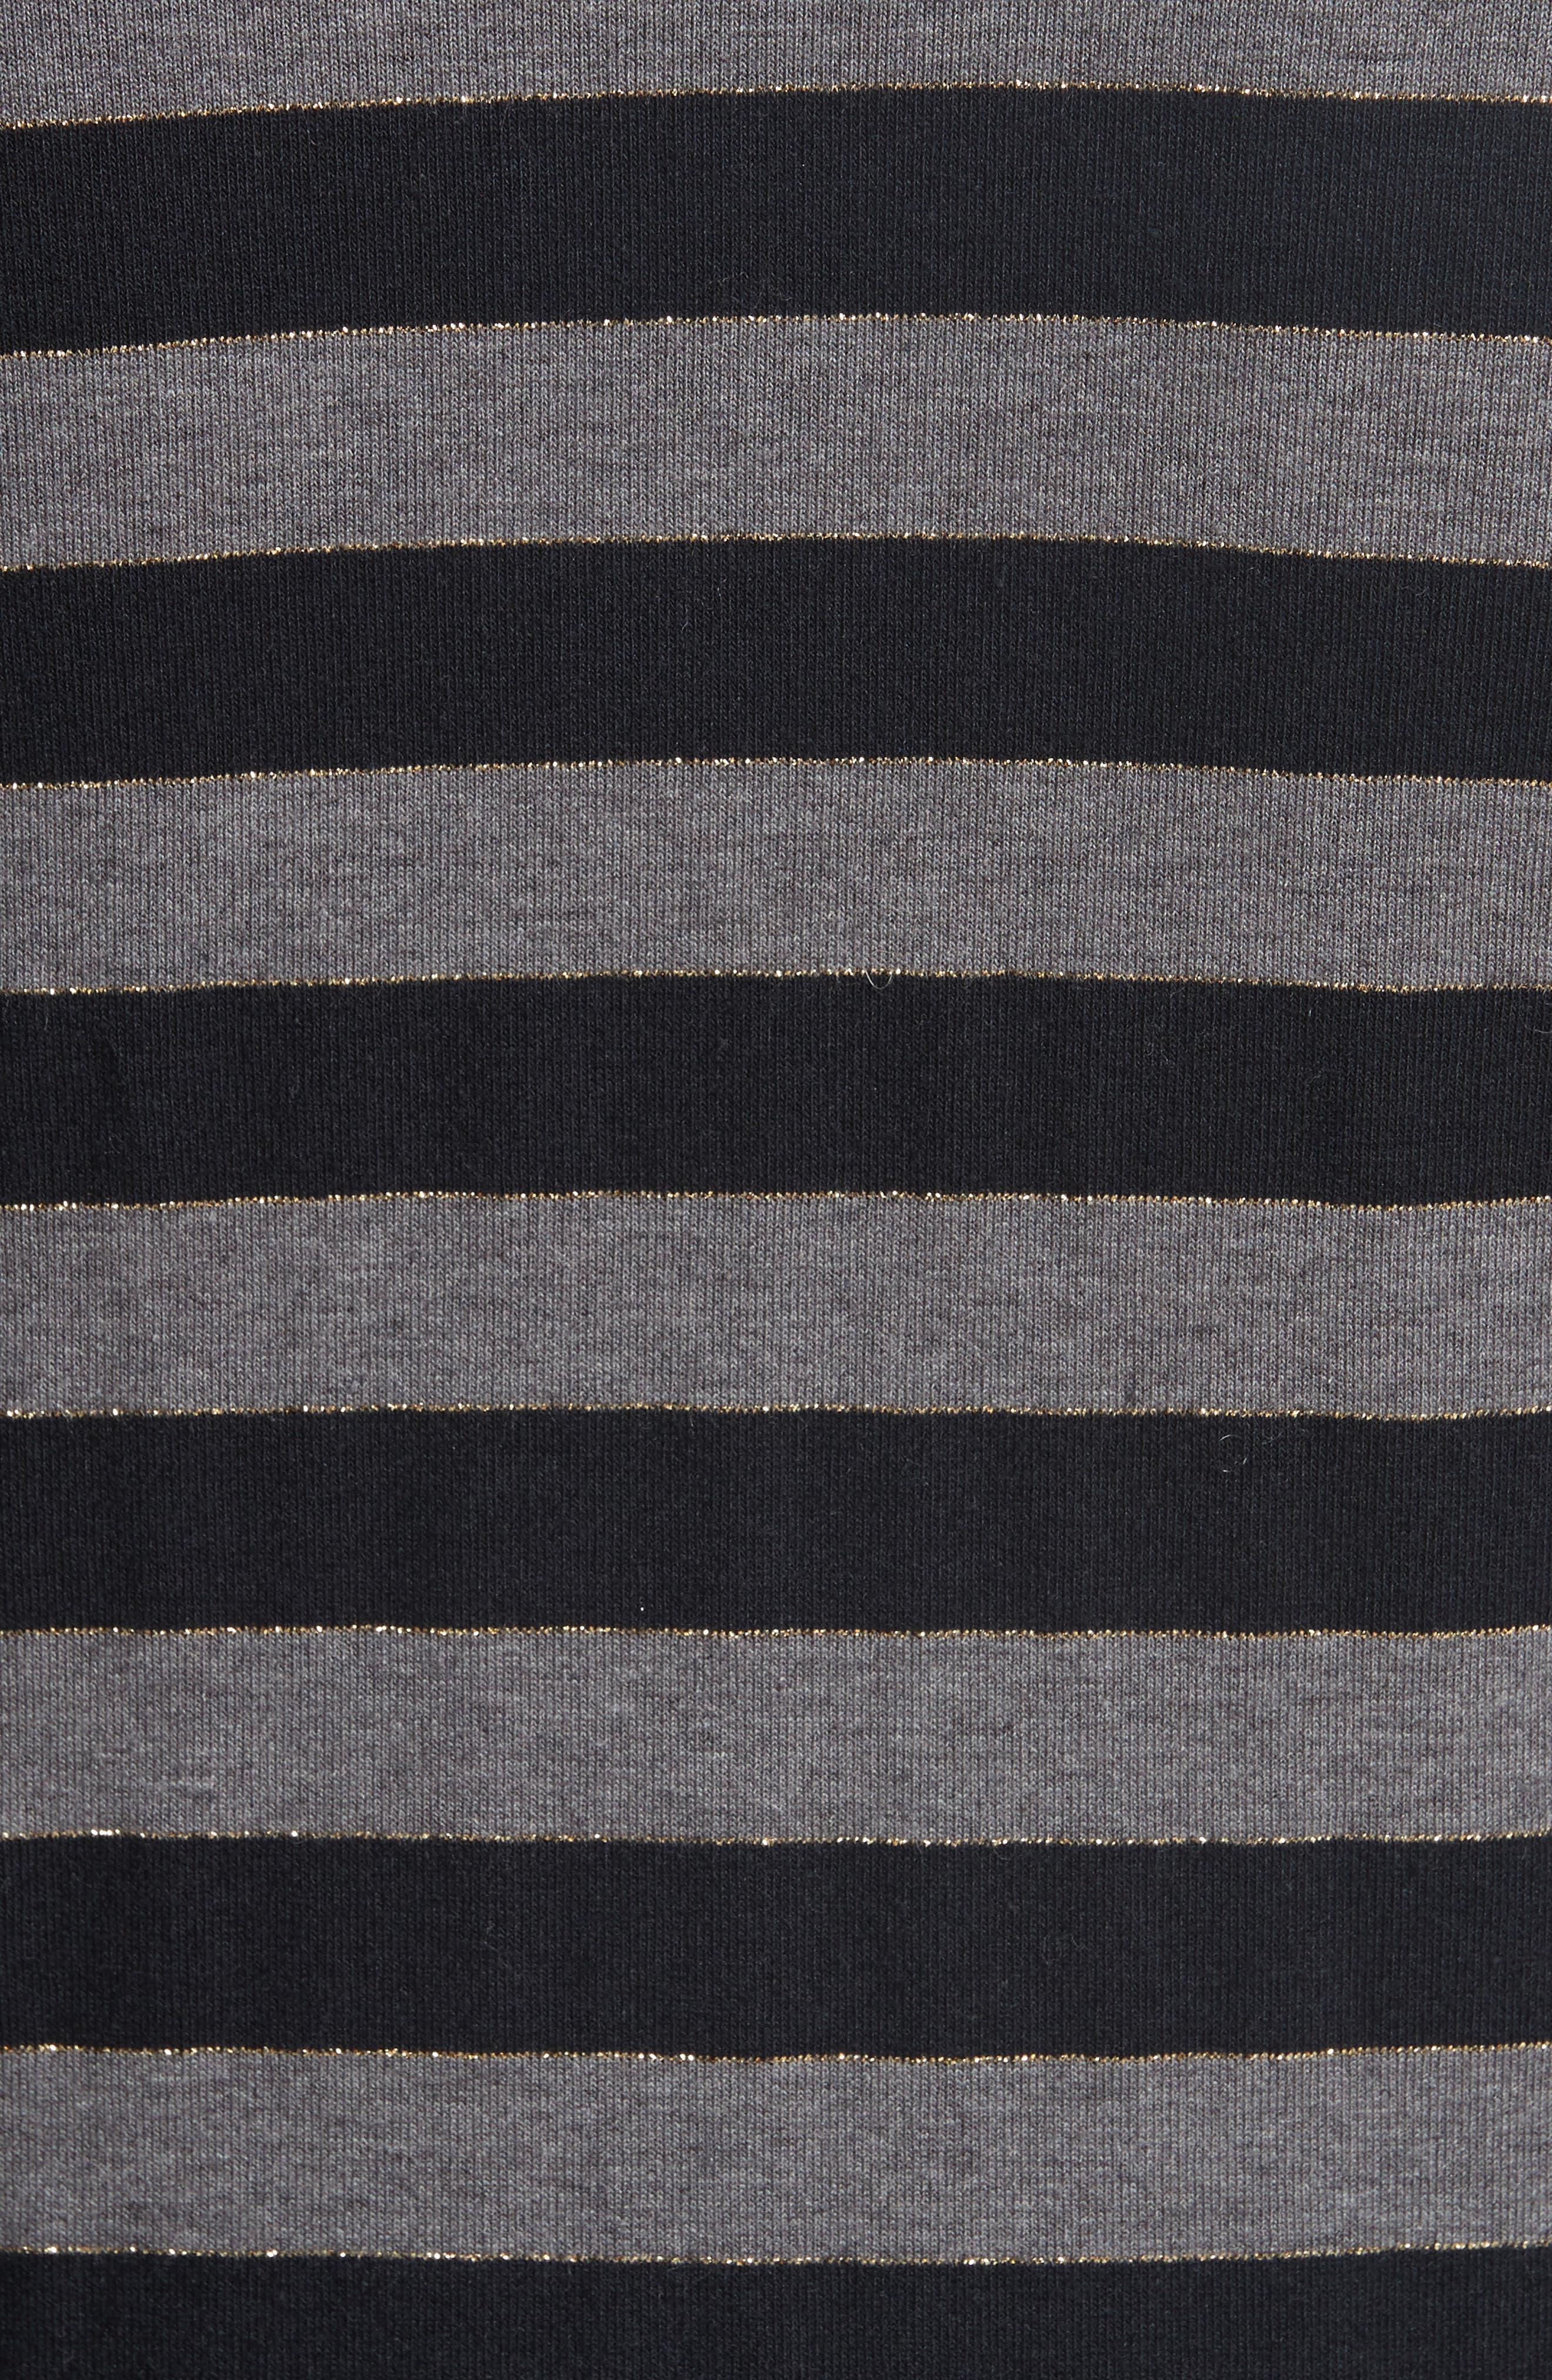 Stripe Jersey Fit & Flare Dress,                             Alternate thumbnail 5, color,                             060